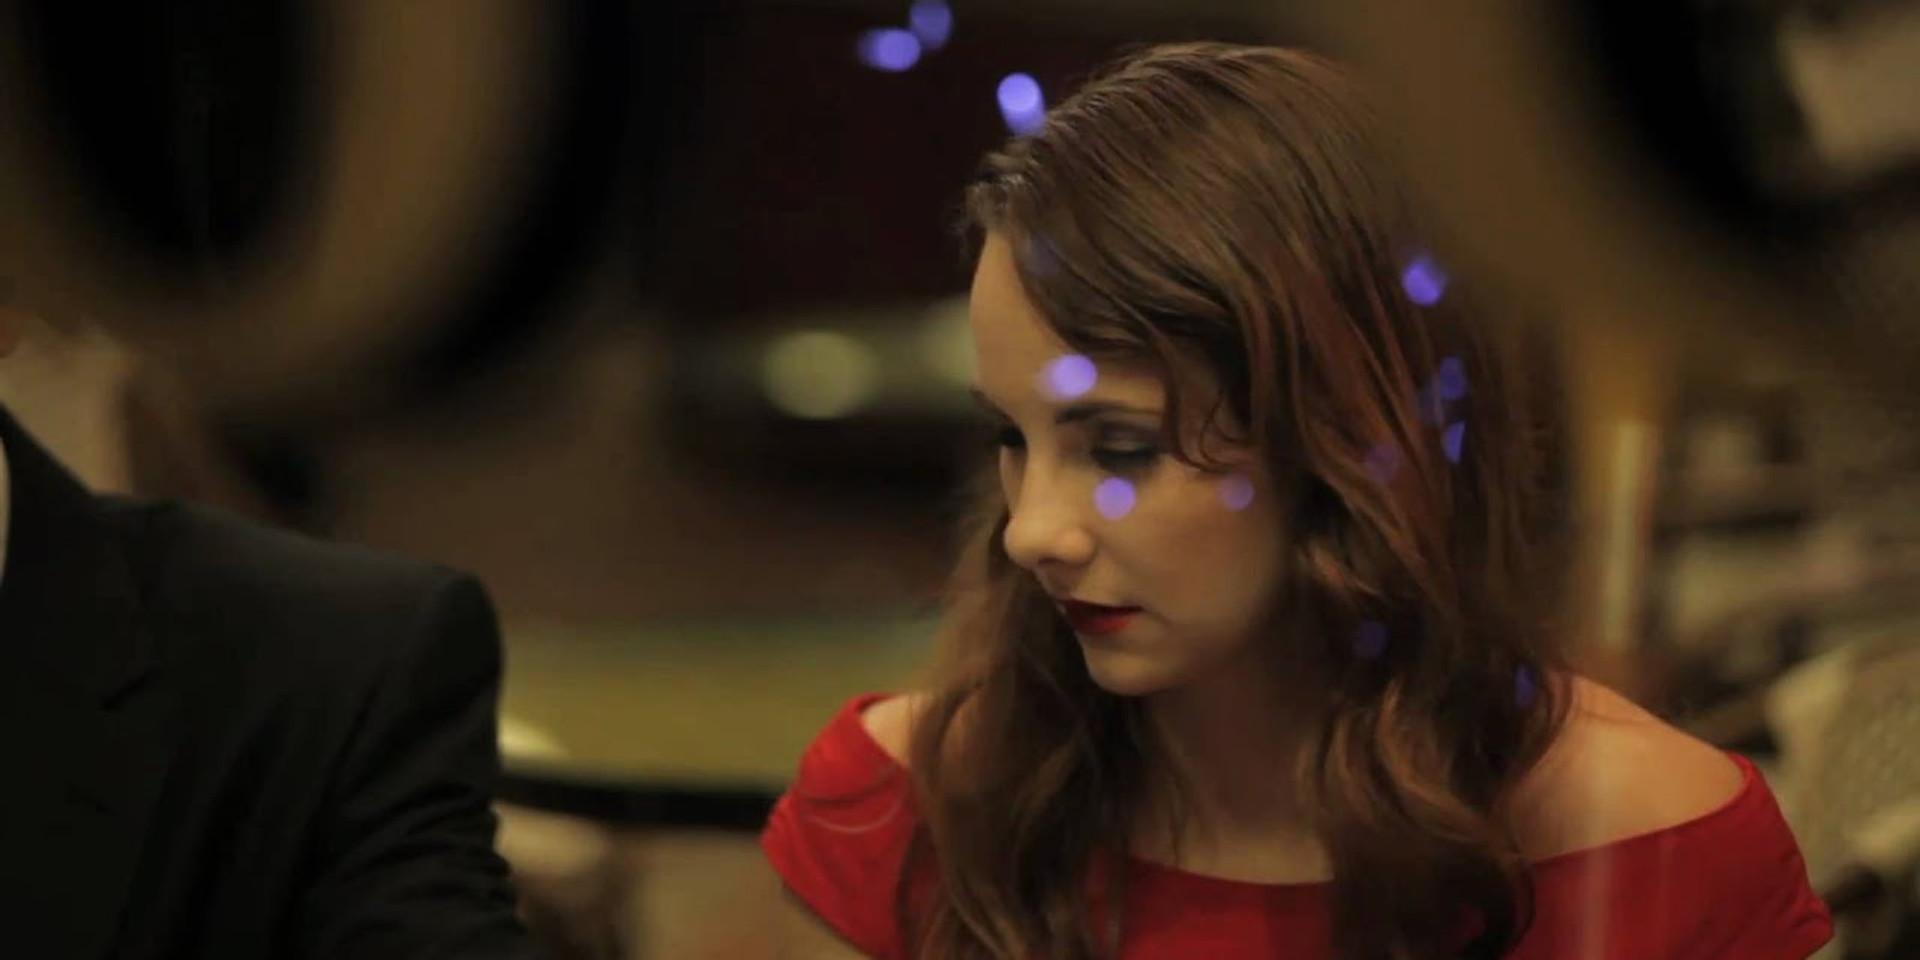 Unsaid: Drama- Ex-Girlfriend- Big Heart